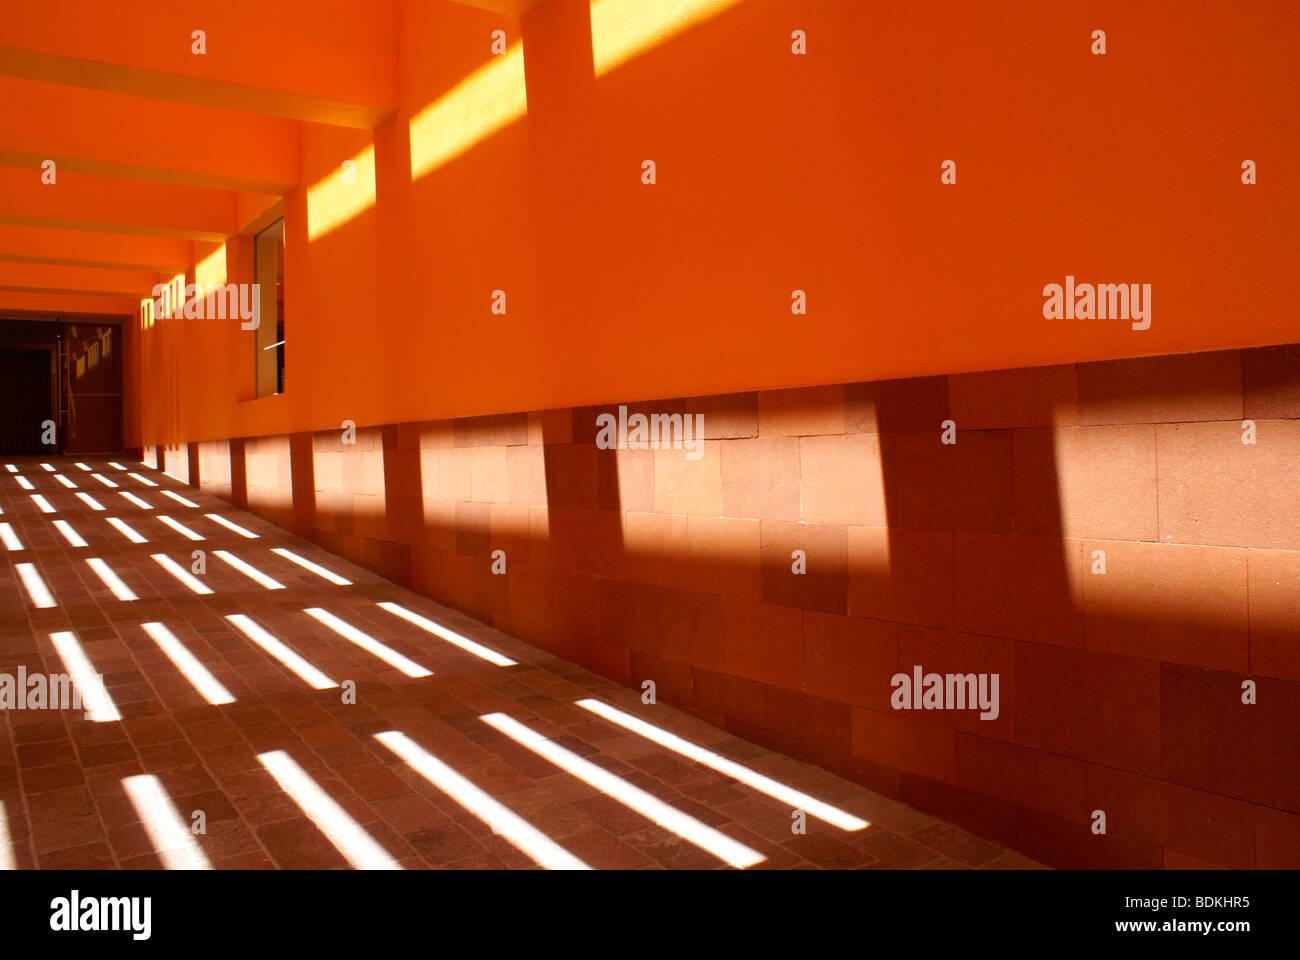 hallway-in-the-museo-del-laberinto-museu